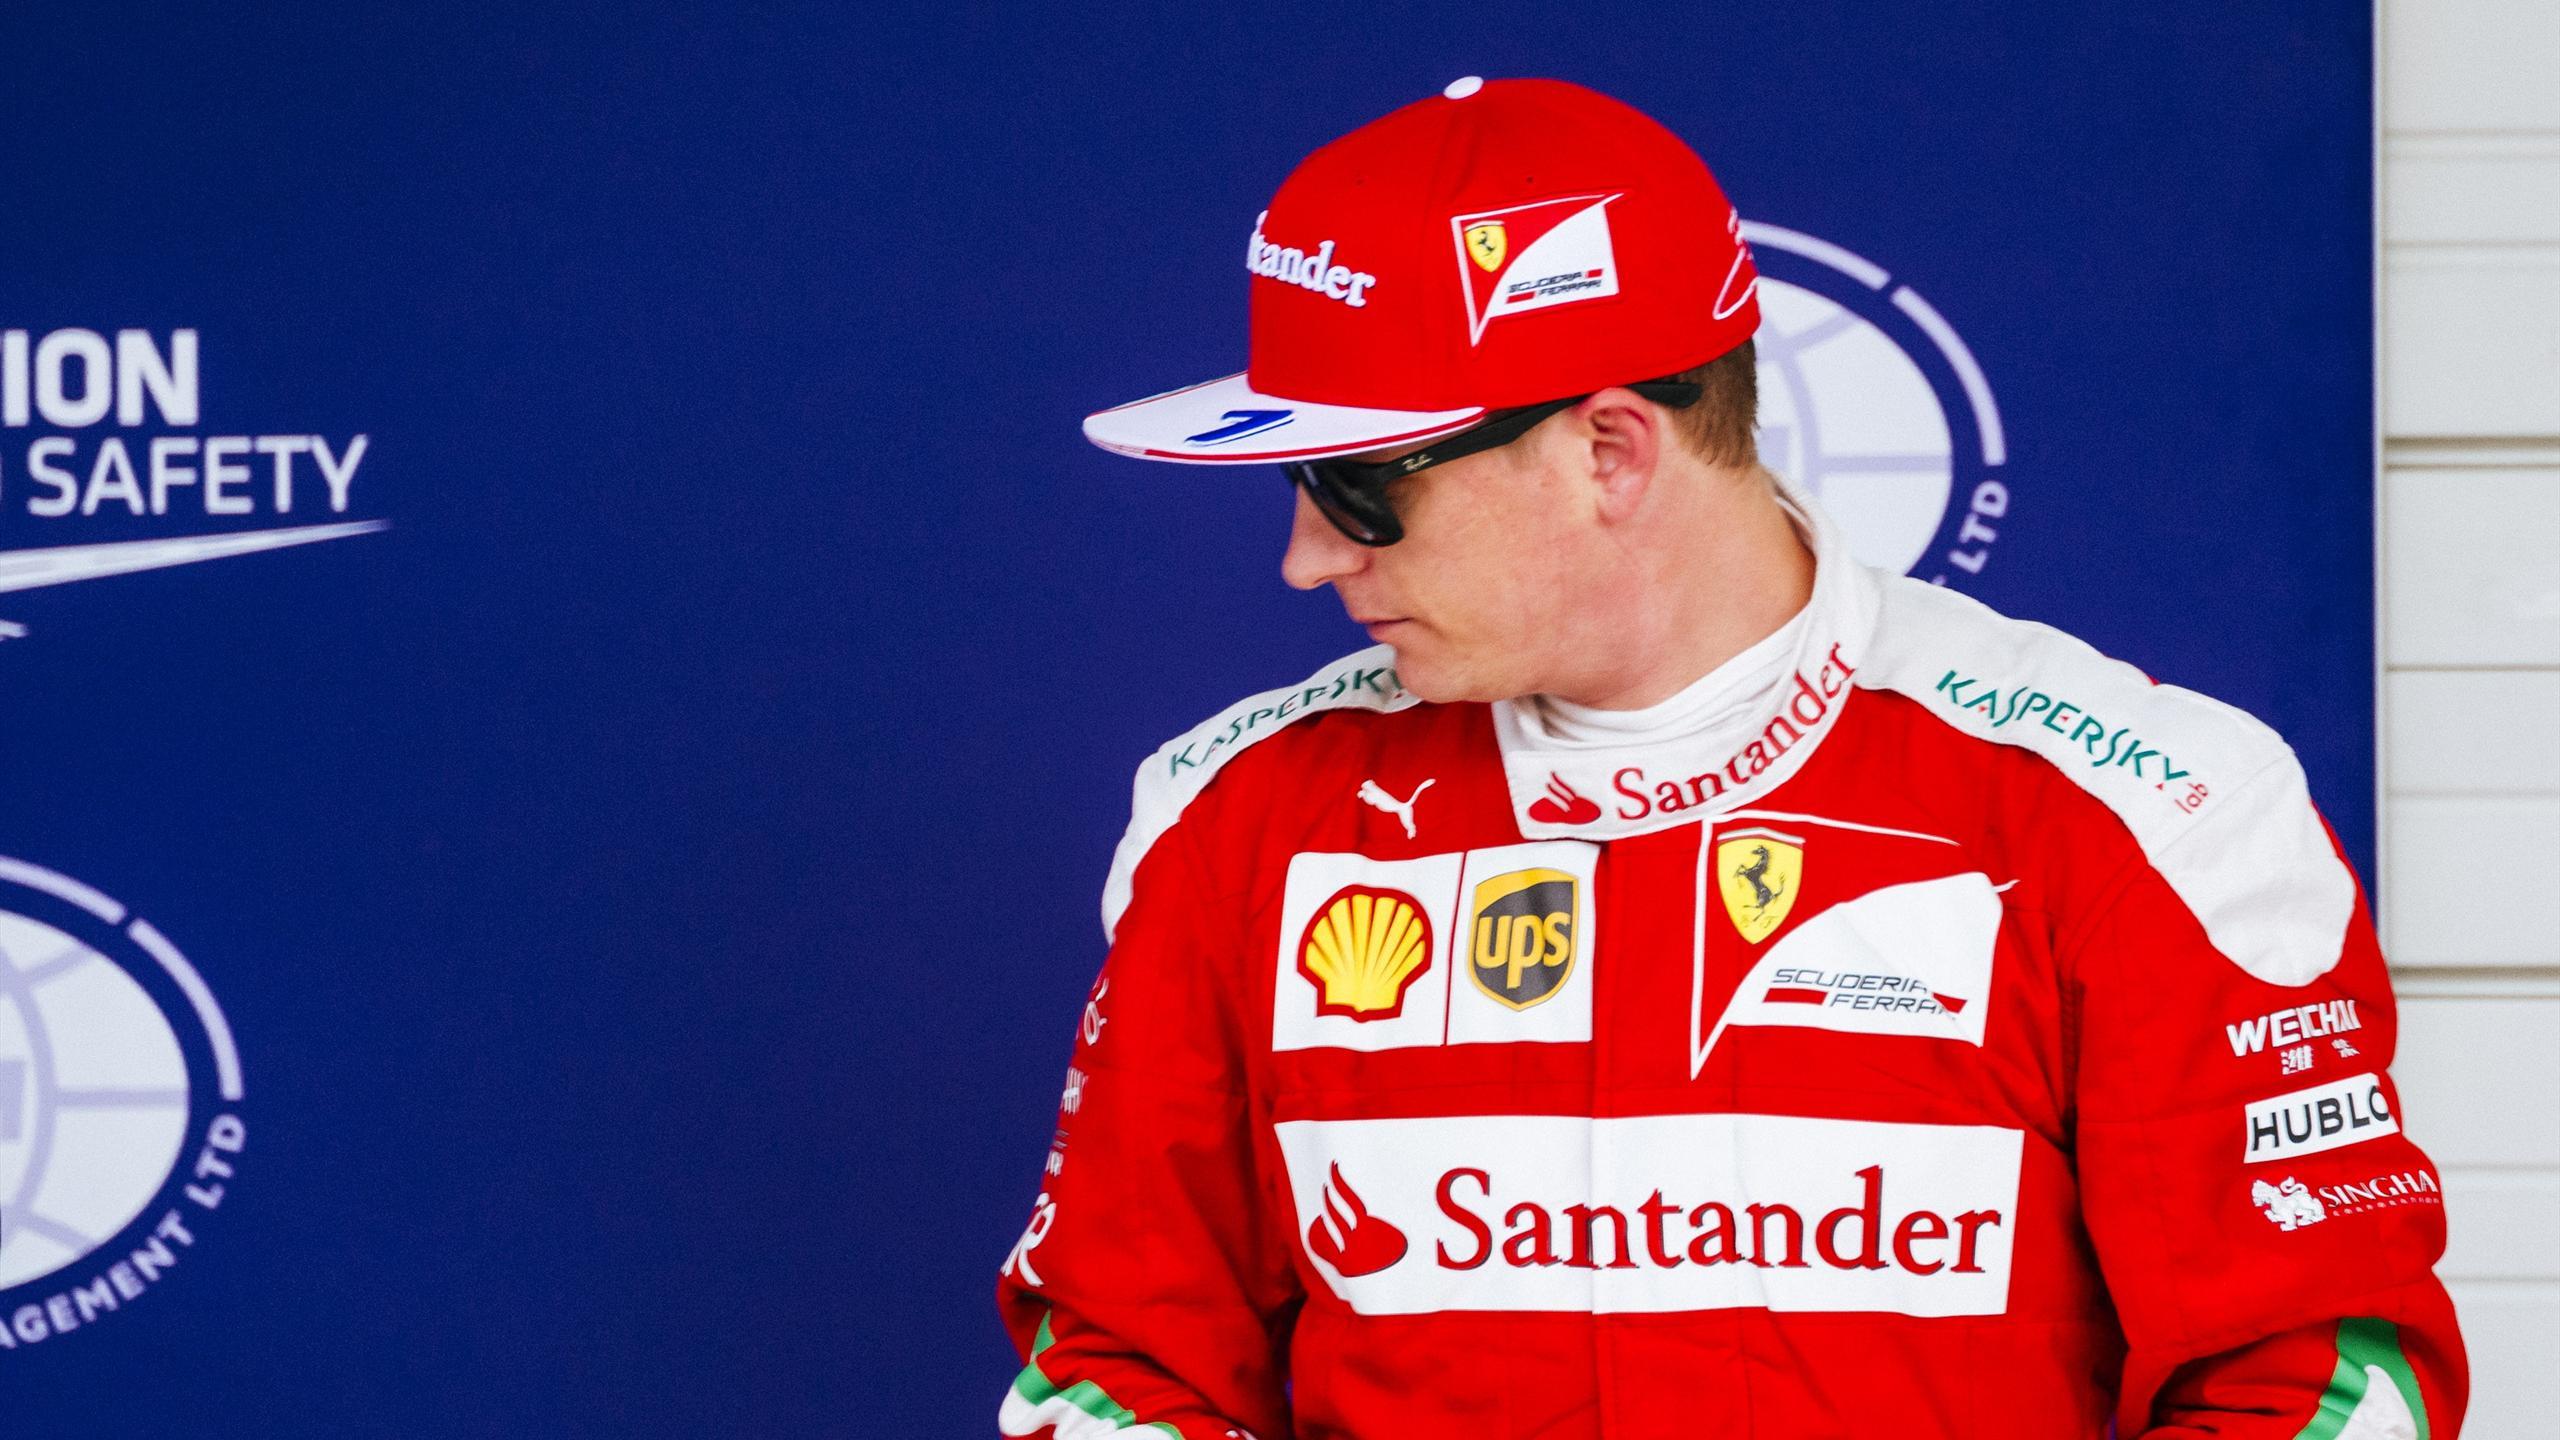 Kimi Räikkönen (Ferrari) au Grand Prix du Japon 2016